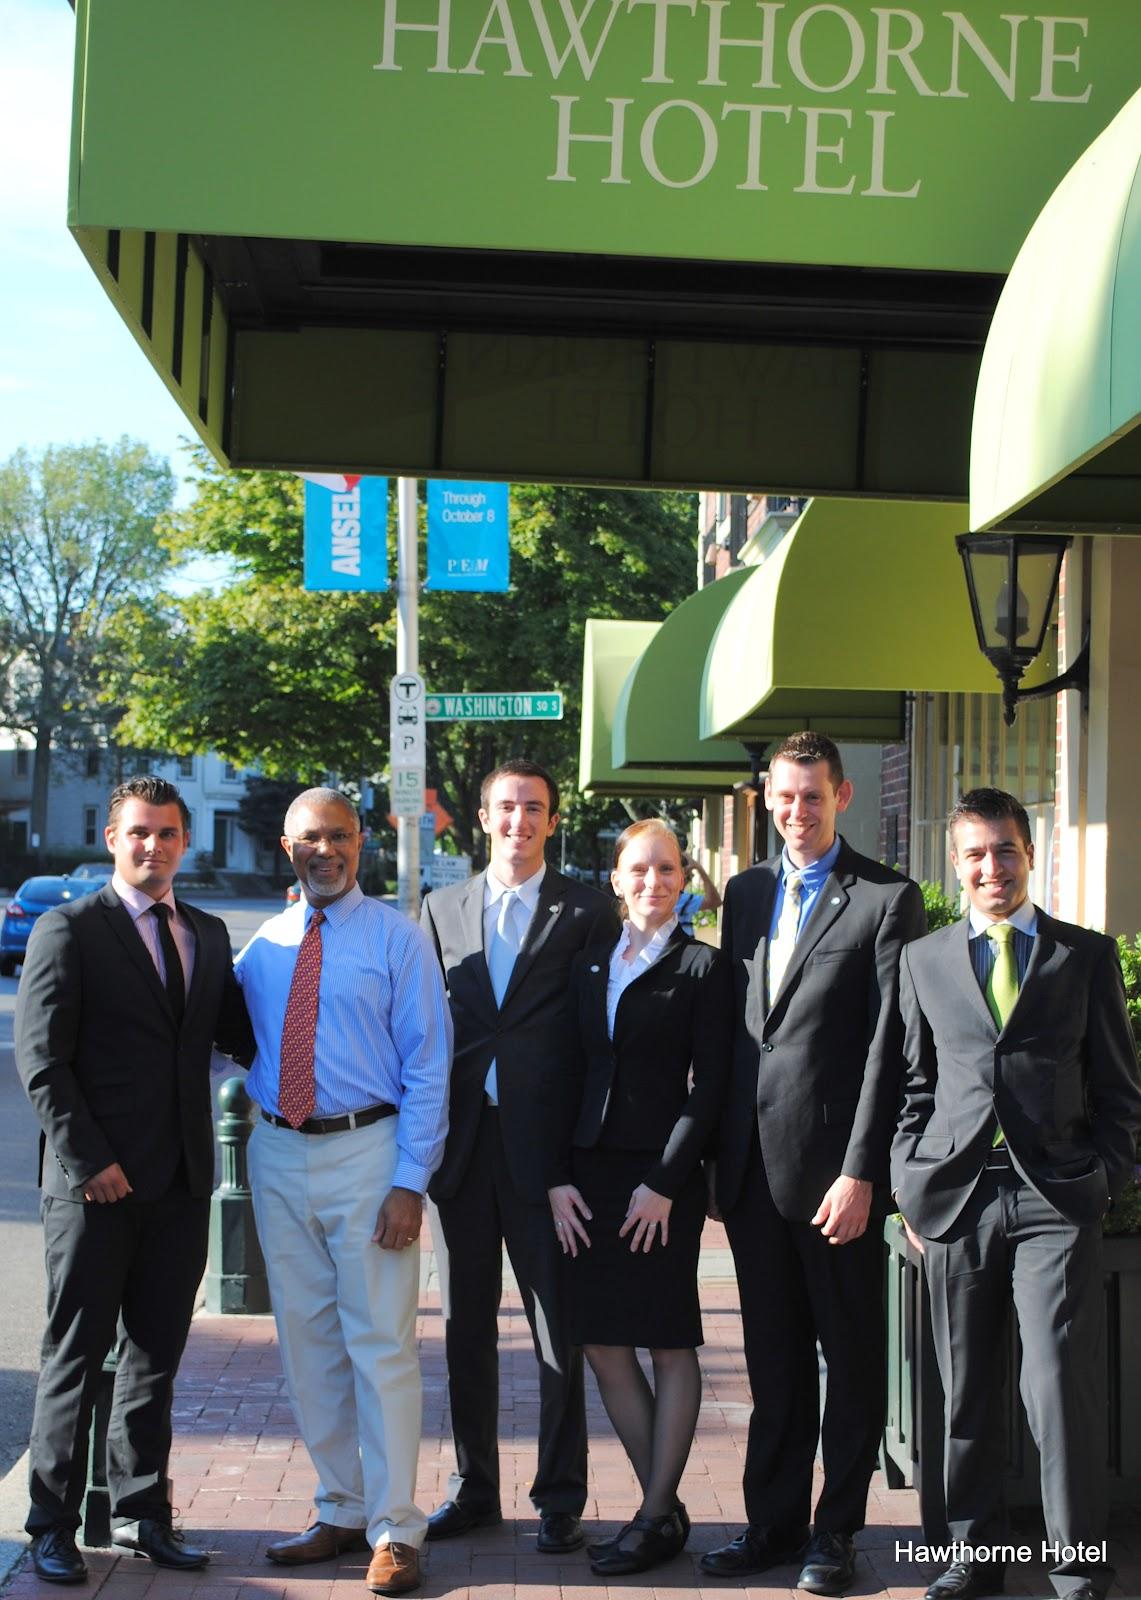 Hawthorne Hotel: Endicott Students Field Trip to Hawthorne Hotel